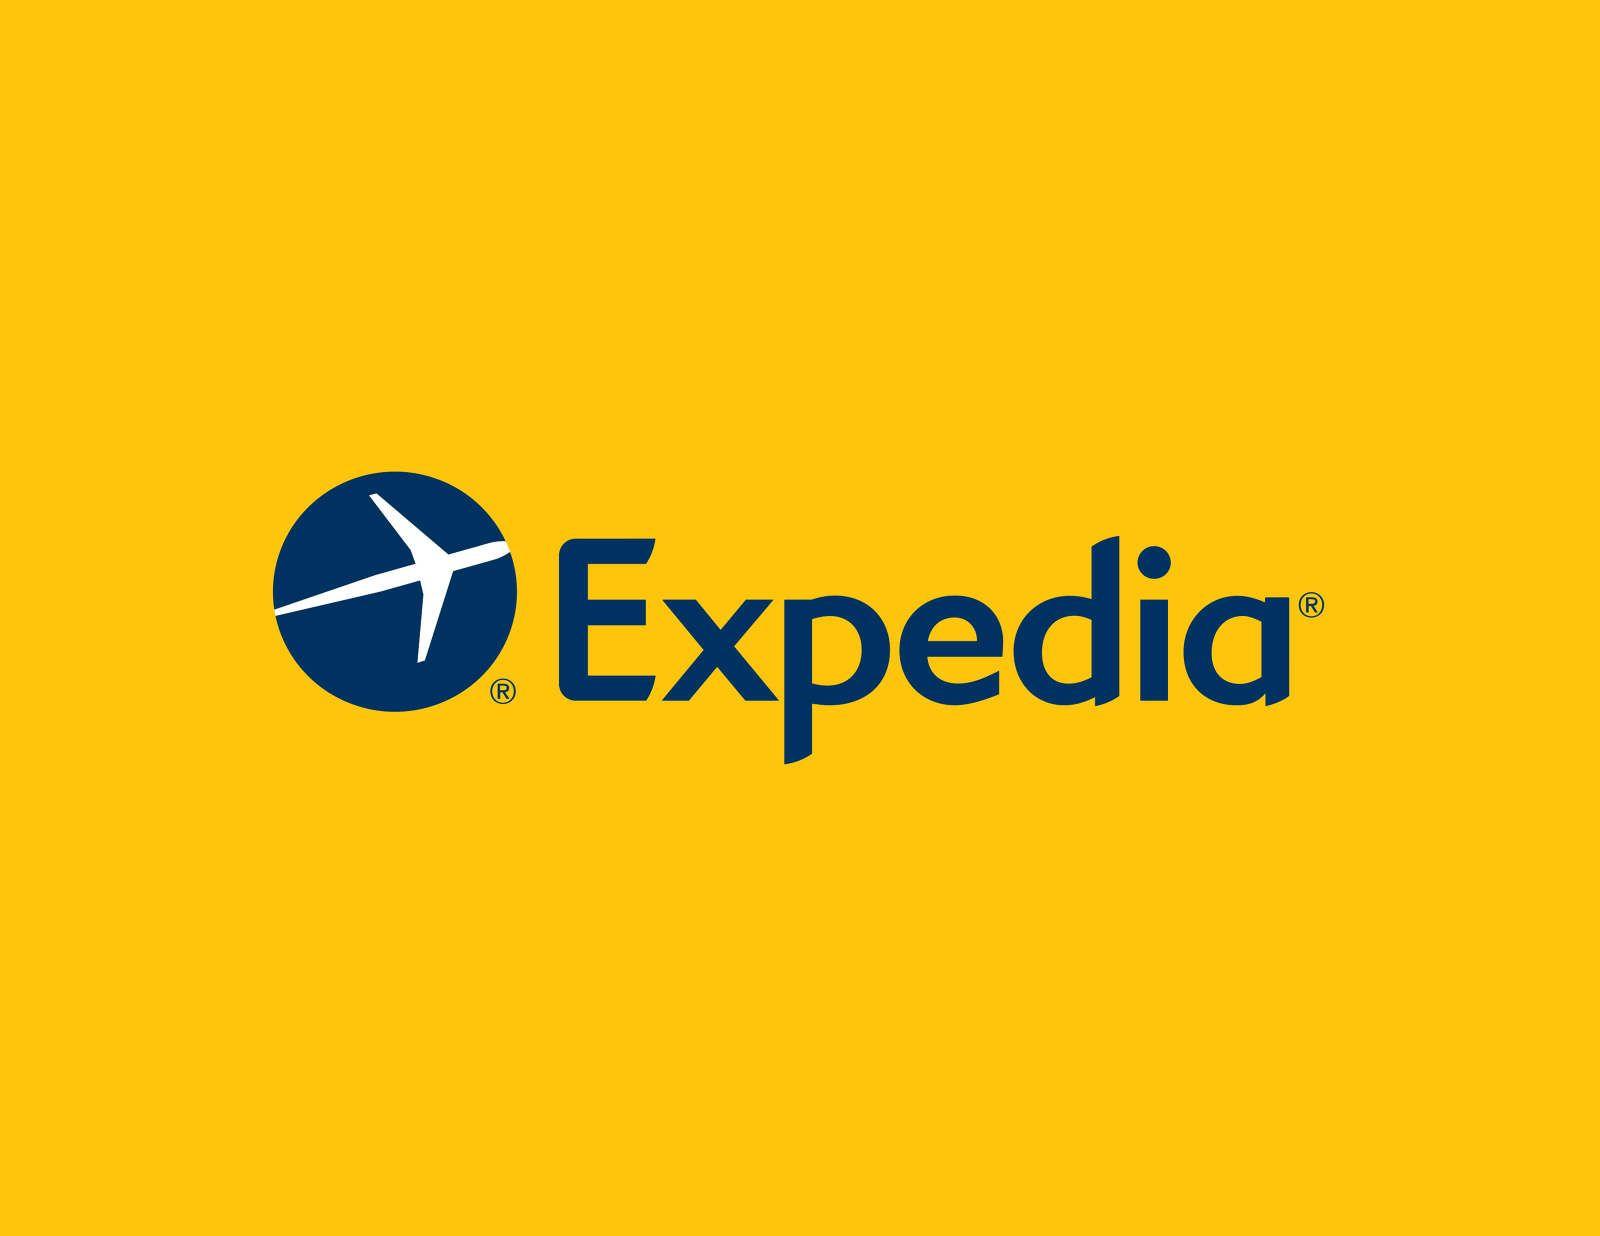 expedia-gallery